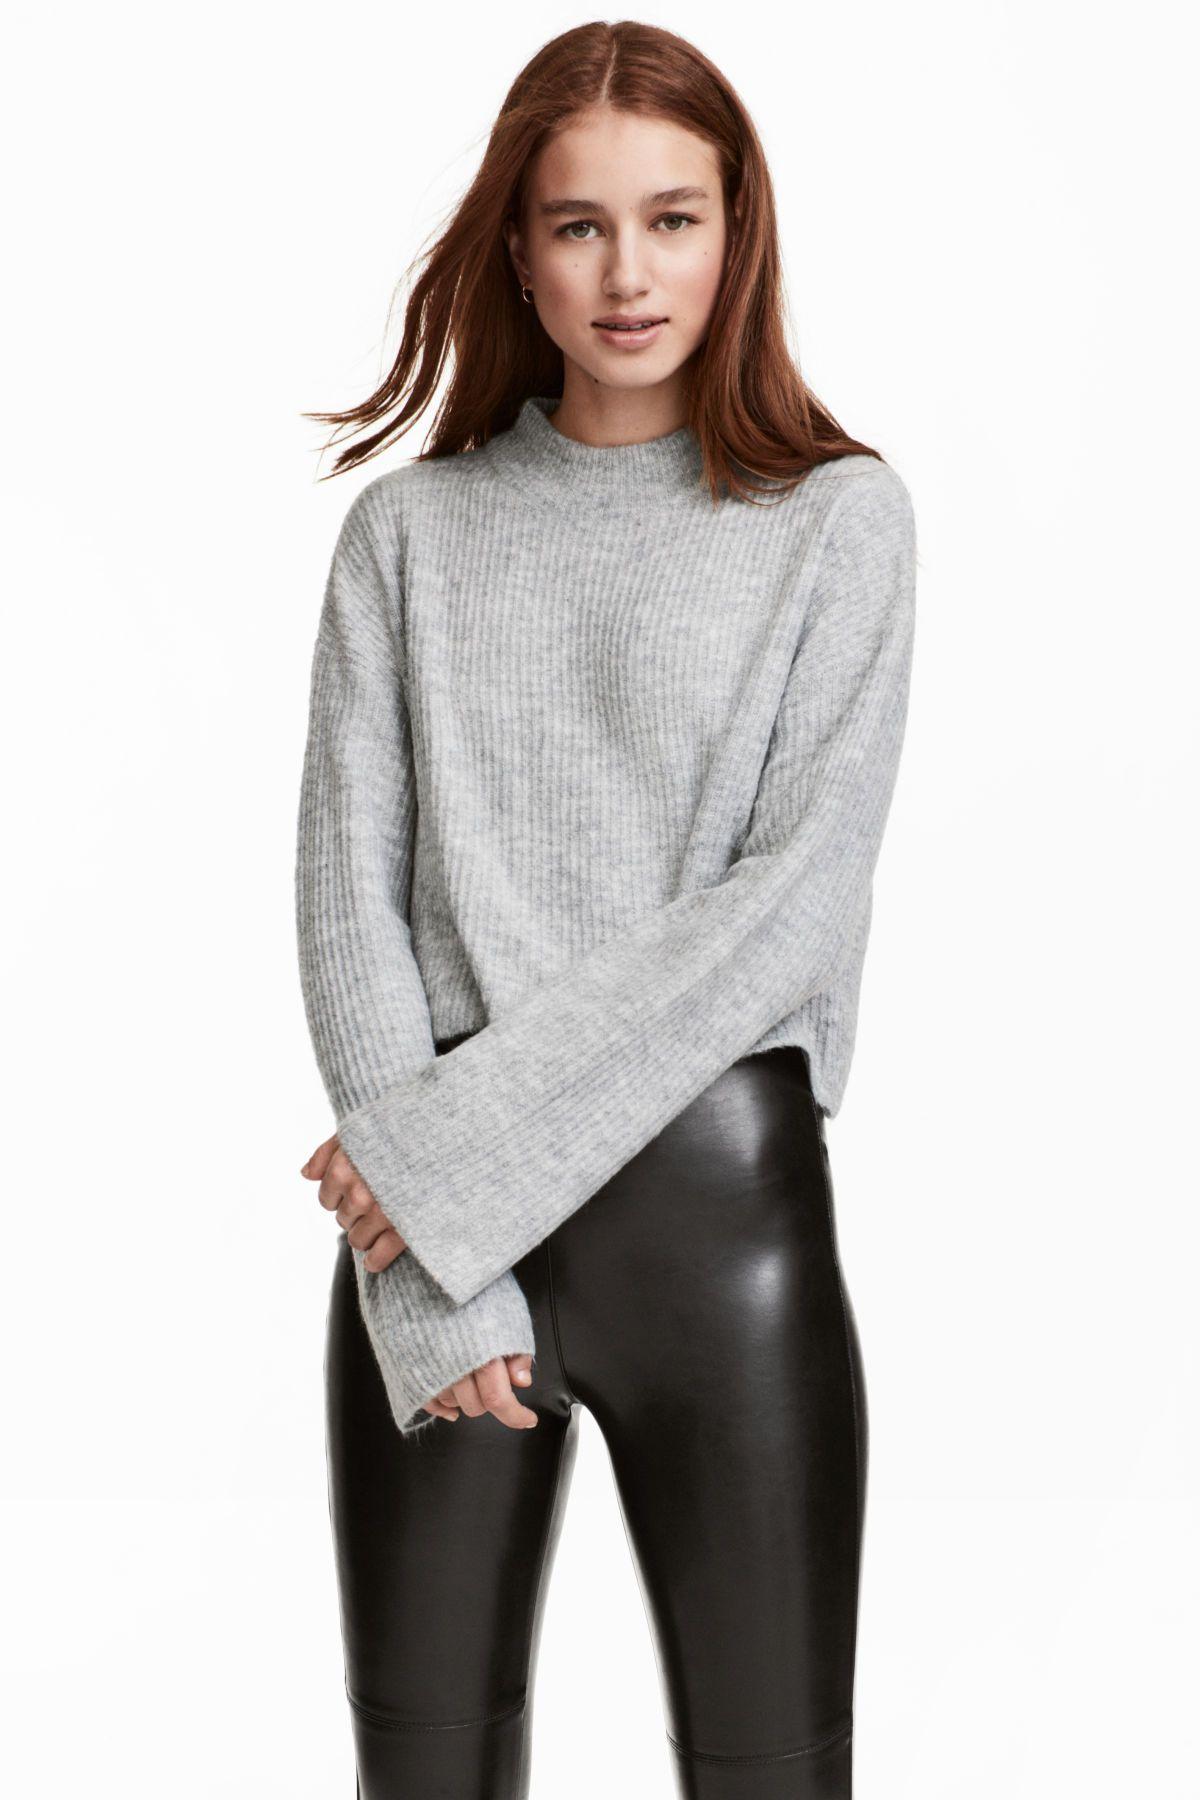 2019 year for lady- Find Shoppingfab hm rib knit sweater